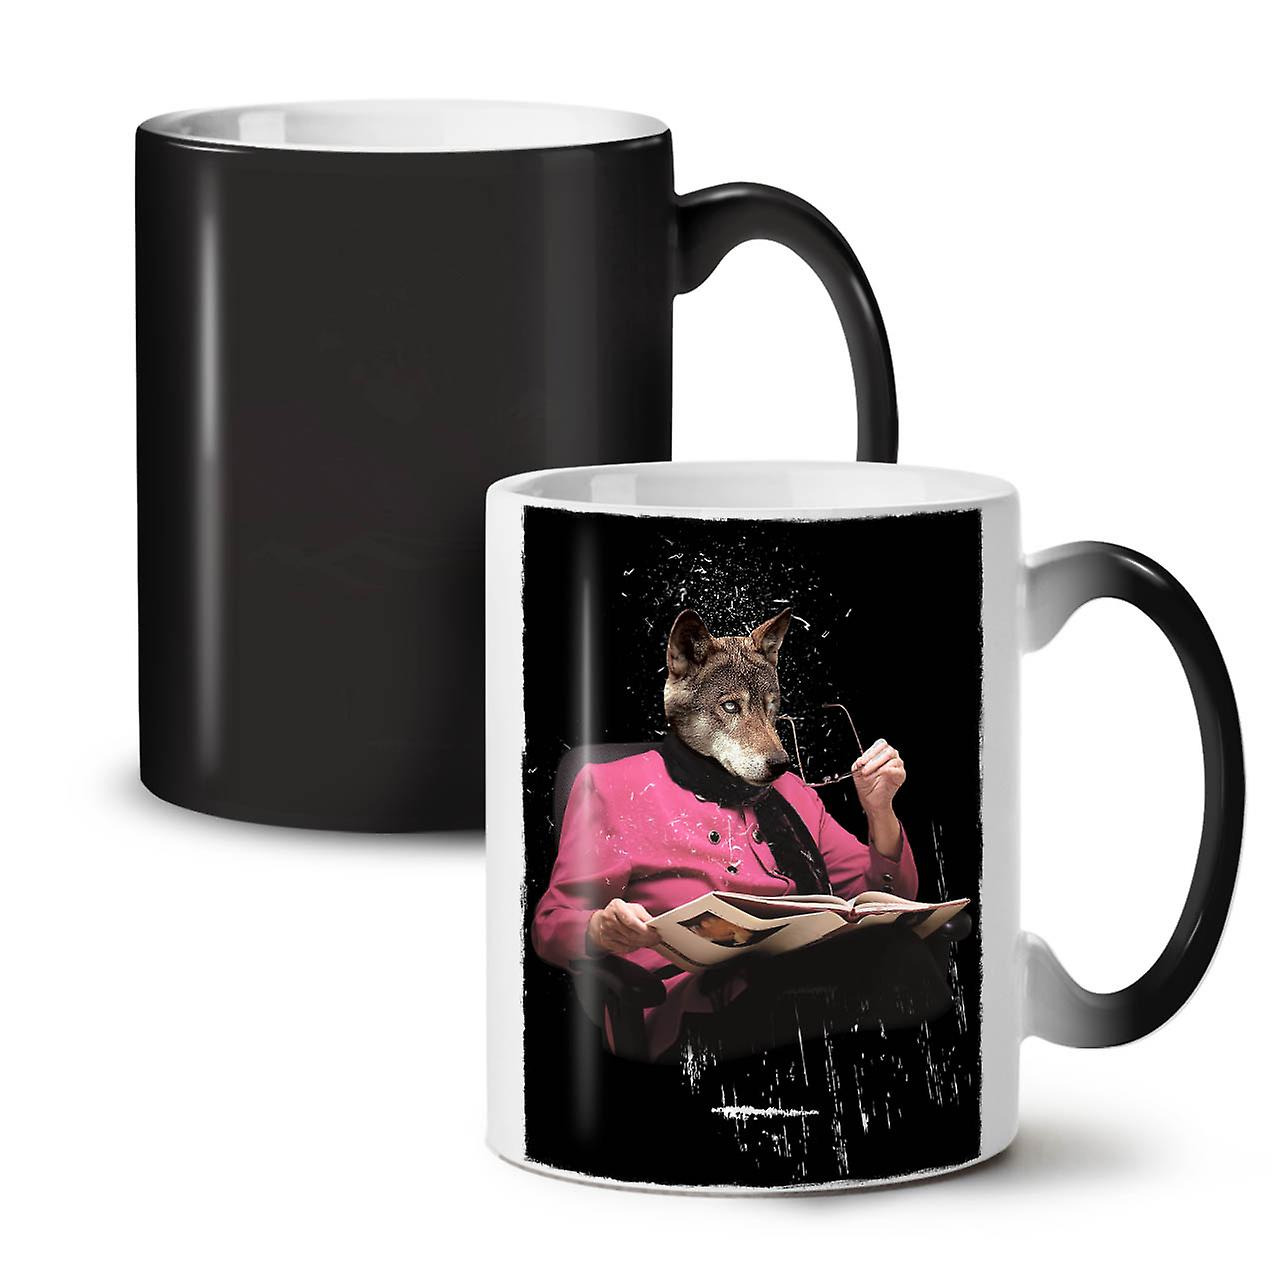 Sir Colour Coffee Mug Bookworm New Tea Ceramic Changing Wolf OzWellcoda Black 11 jqMLSzVGUp